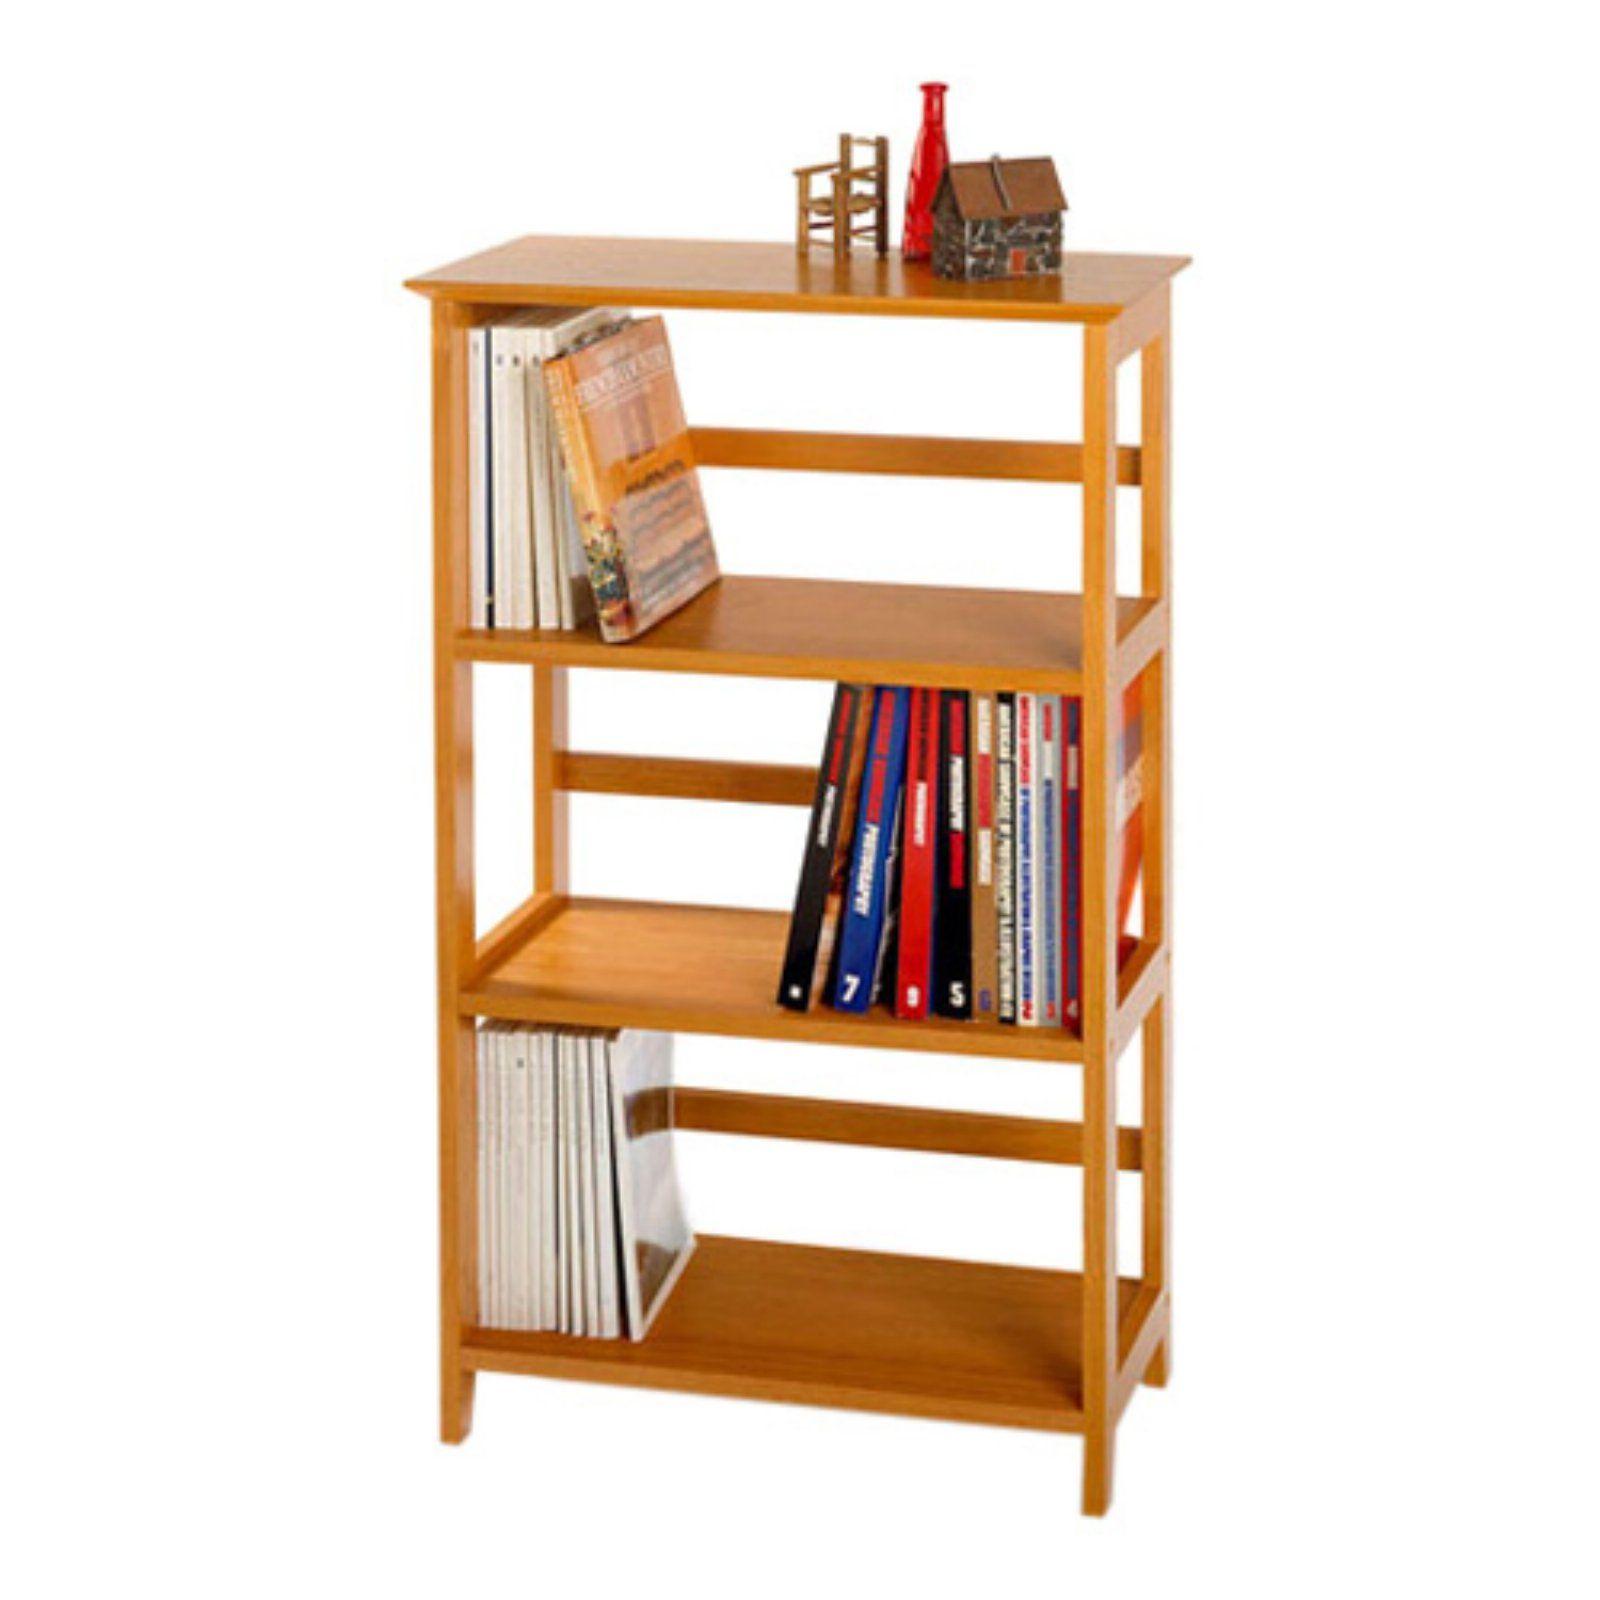 Winsome Studio 3 Tier Wood Bookshelf Home Office Furniture Desk